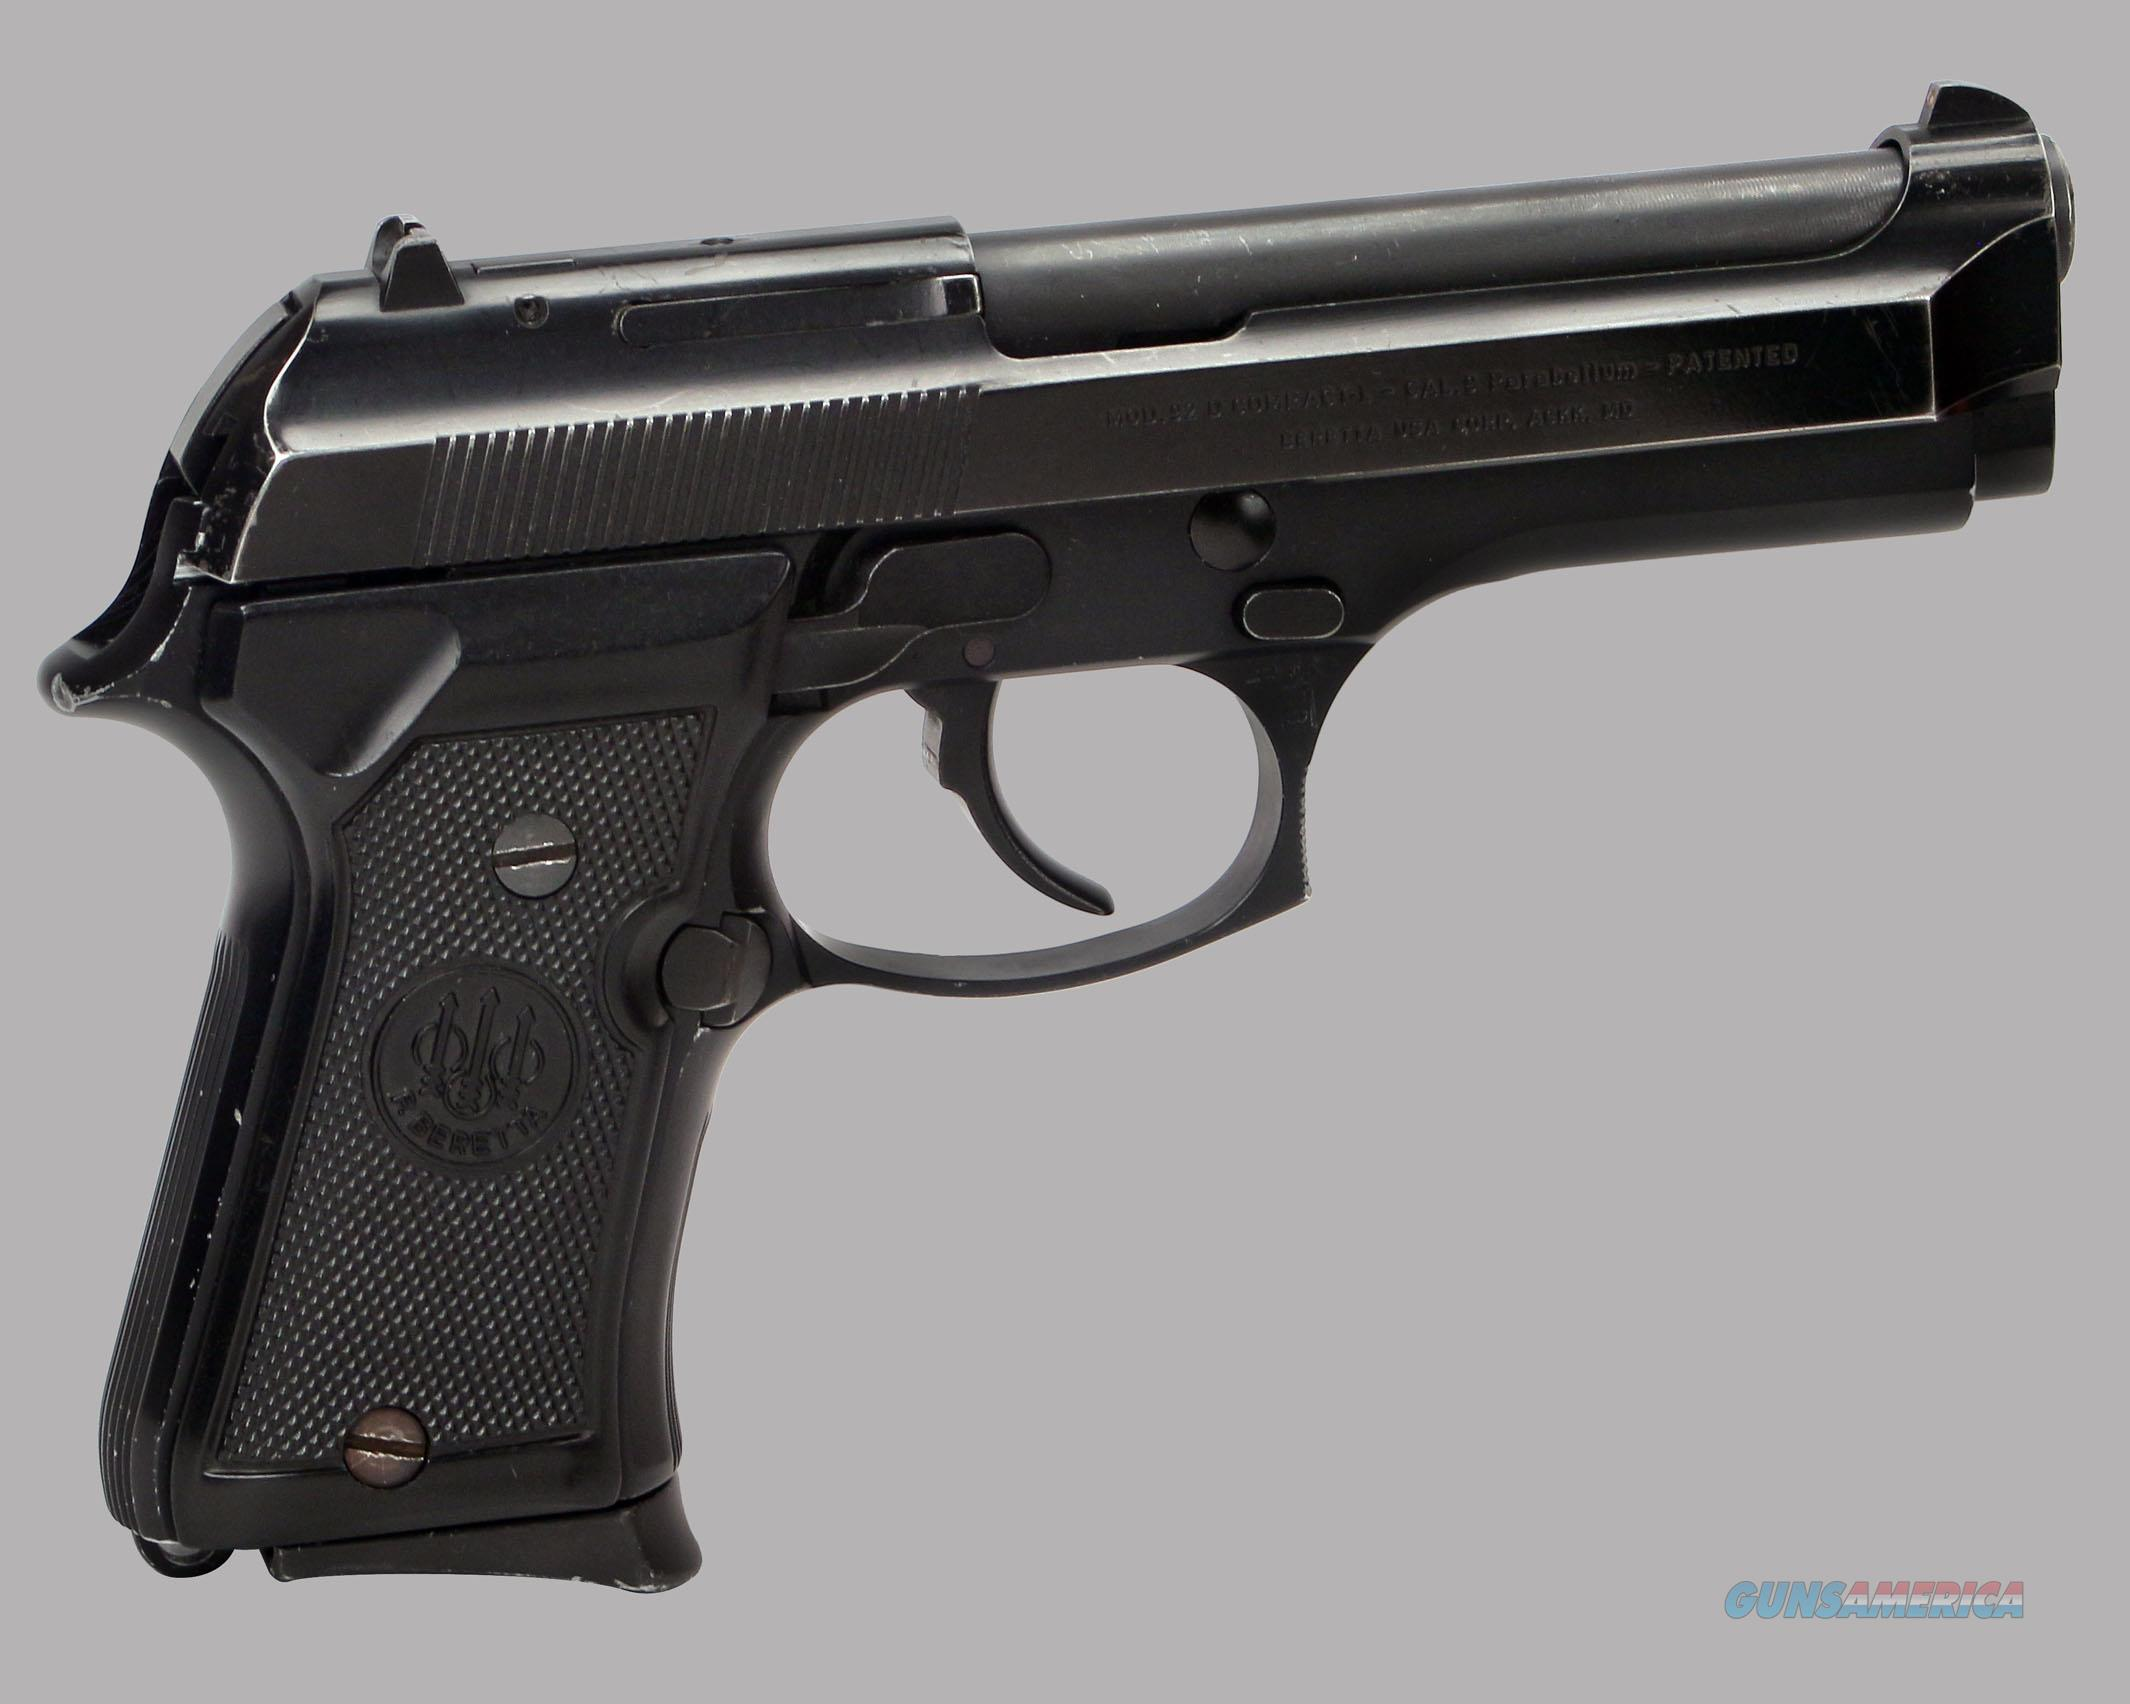 Beretta 9mm 92D Compact L Pistol for sale